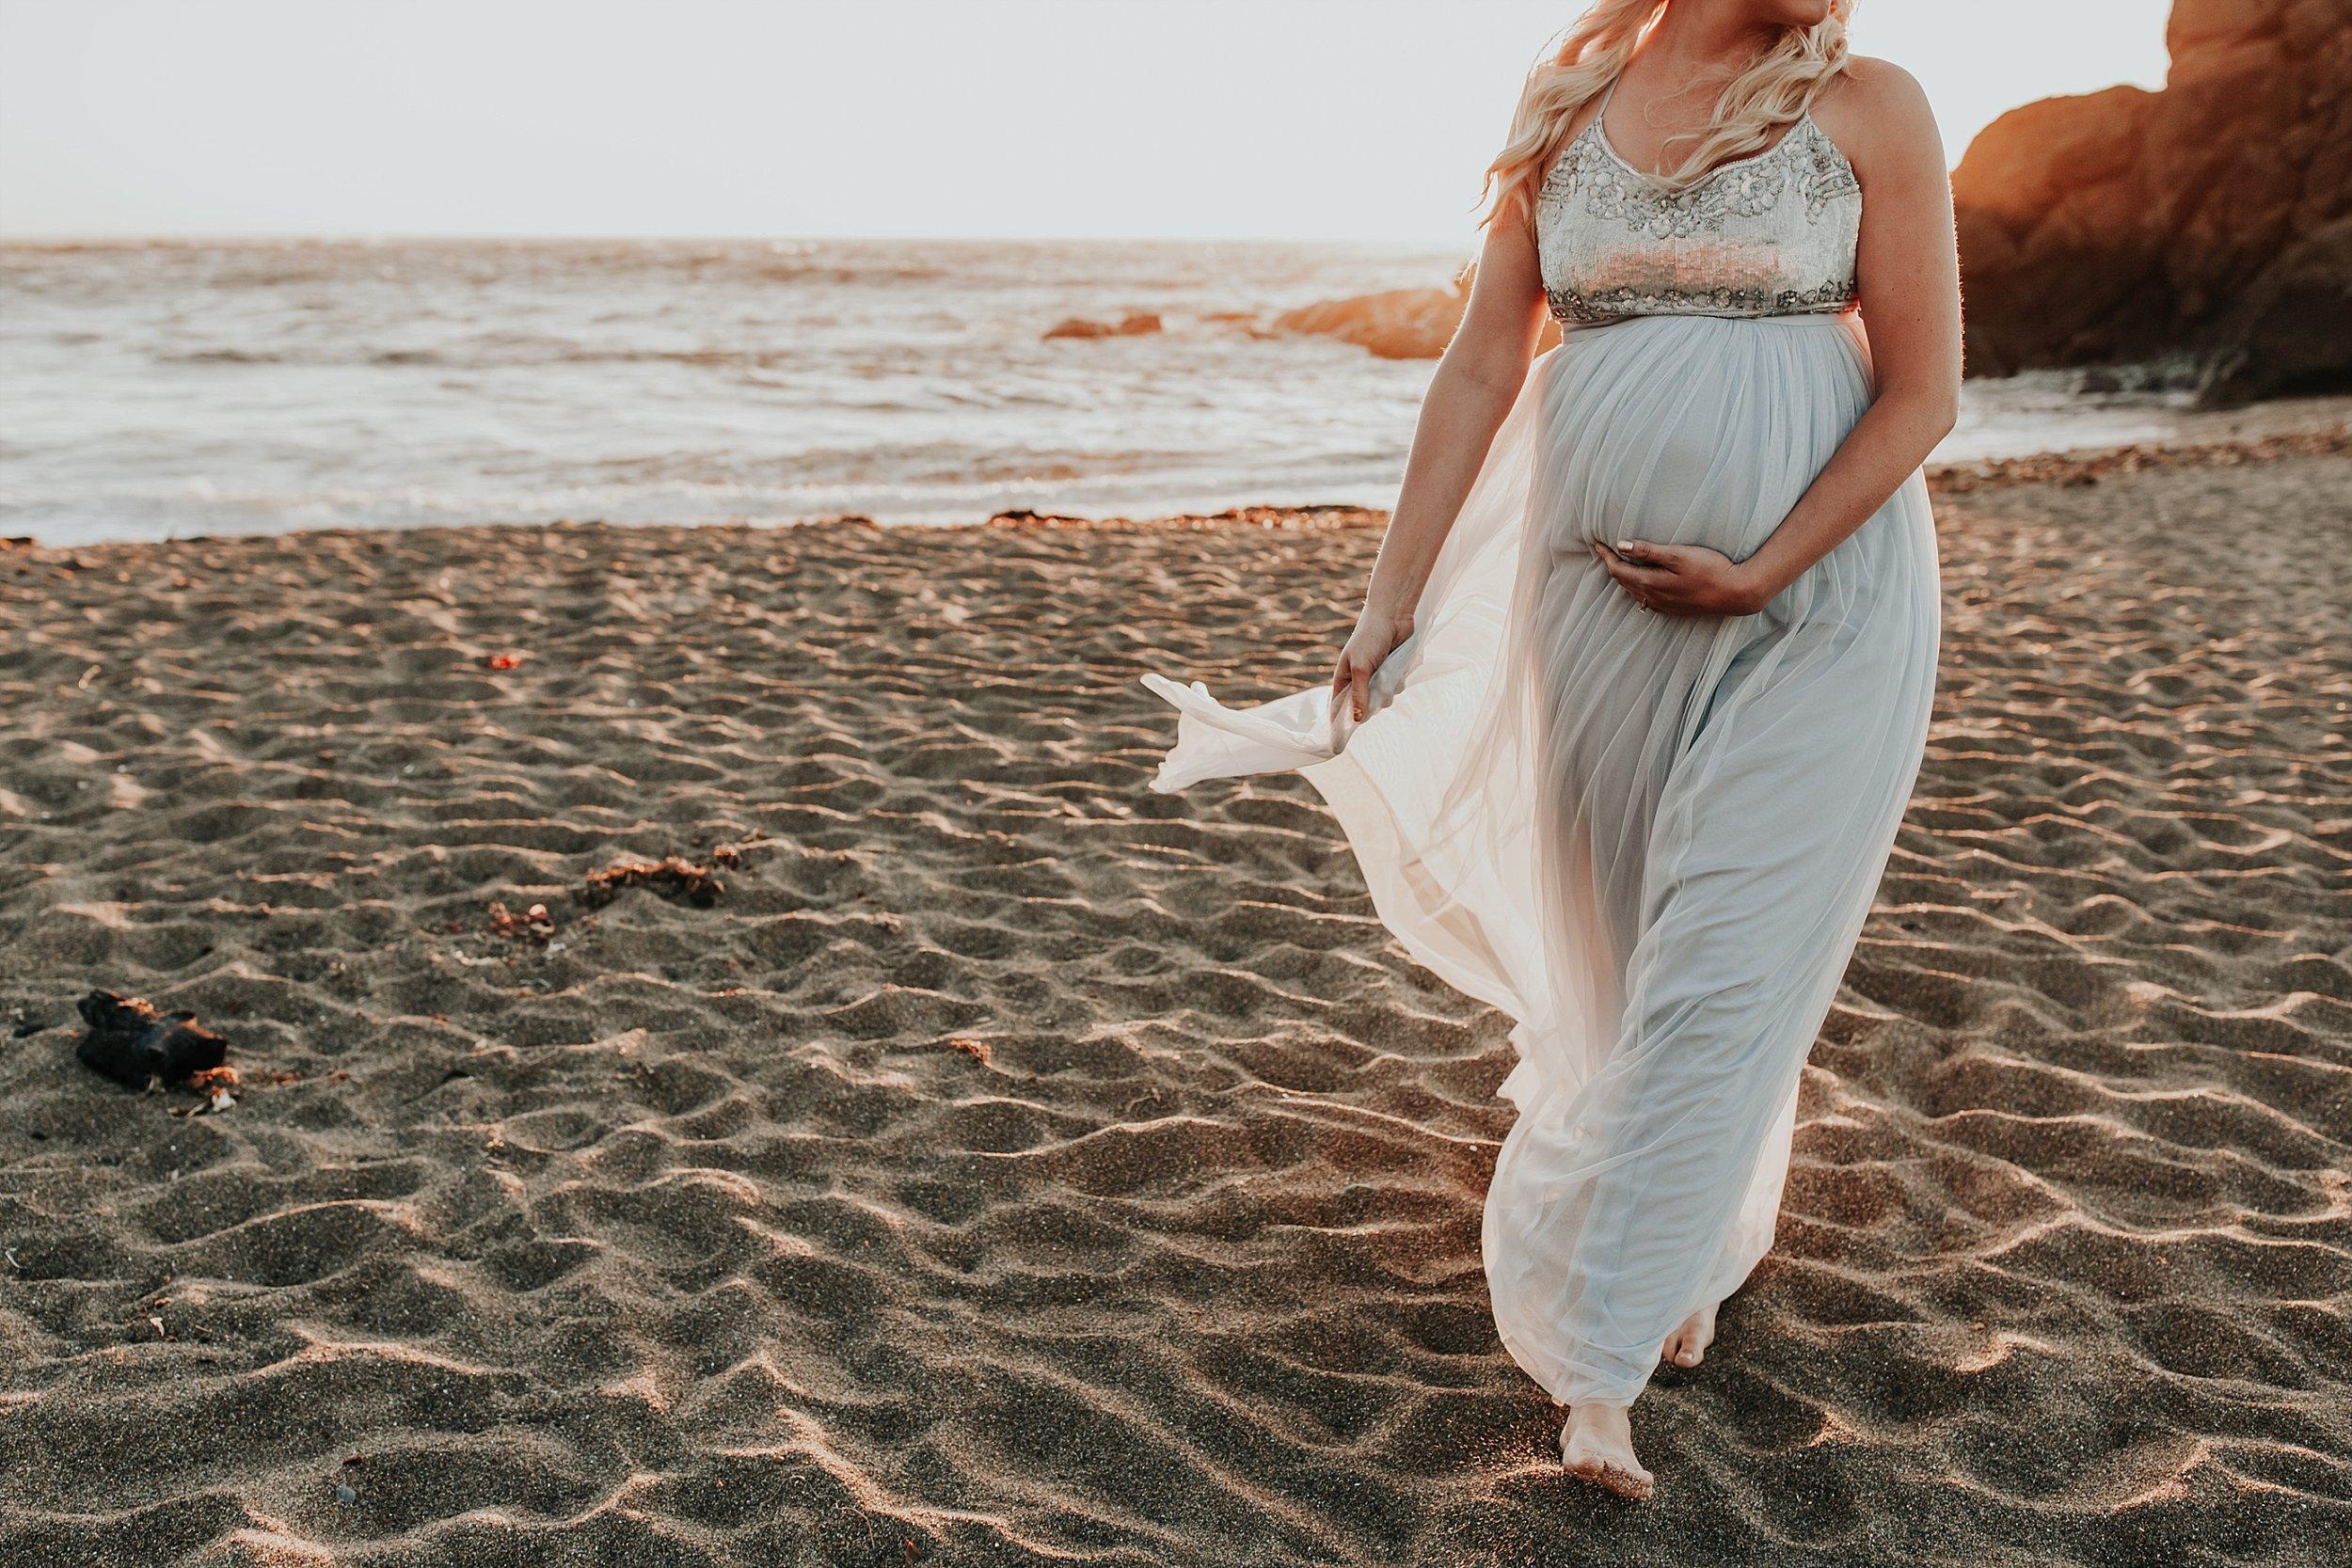 Lincoln CIty Oregon Coast Maternity Photographer (19).jpg